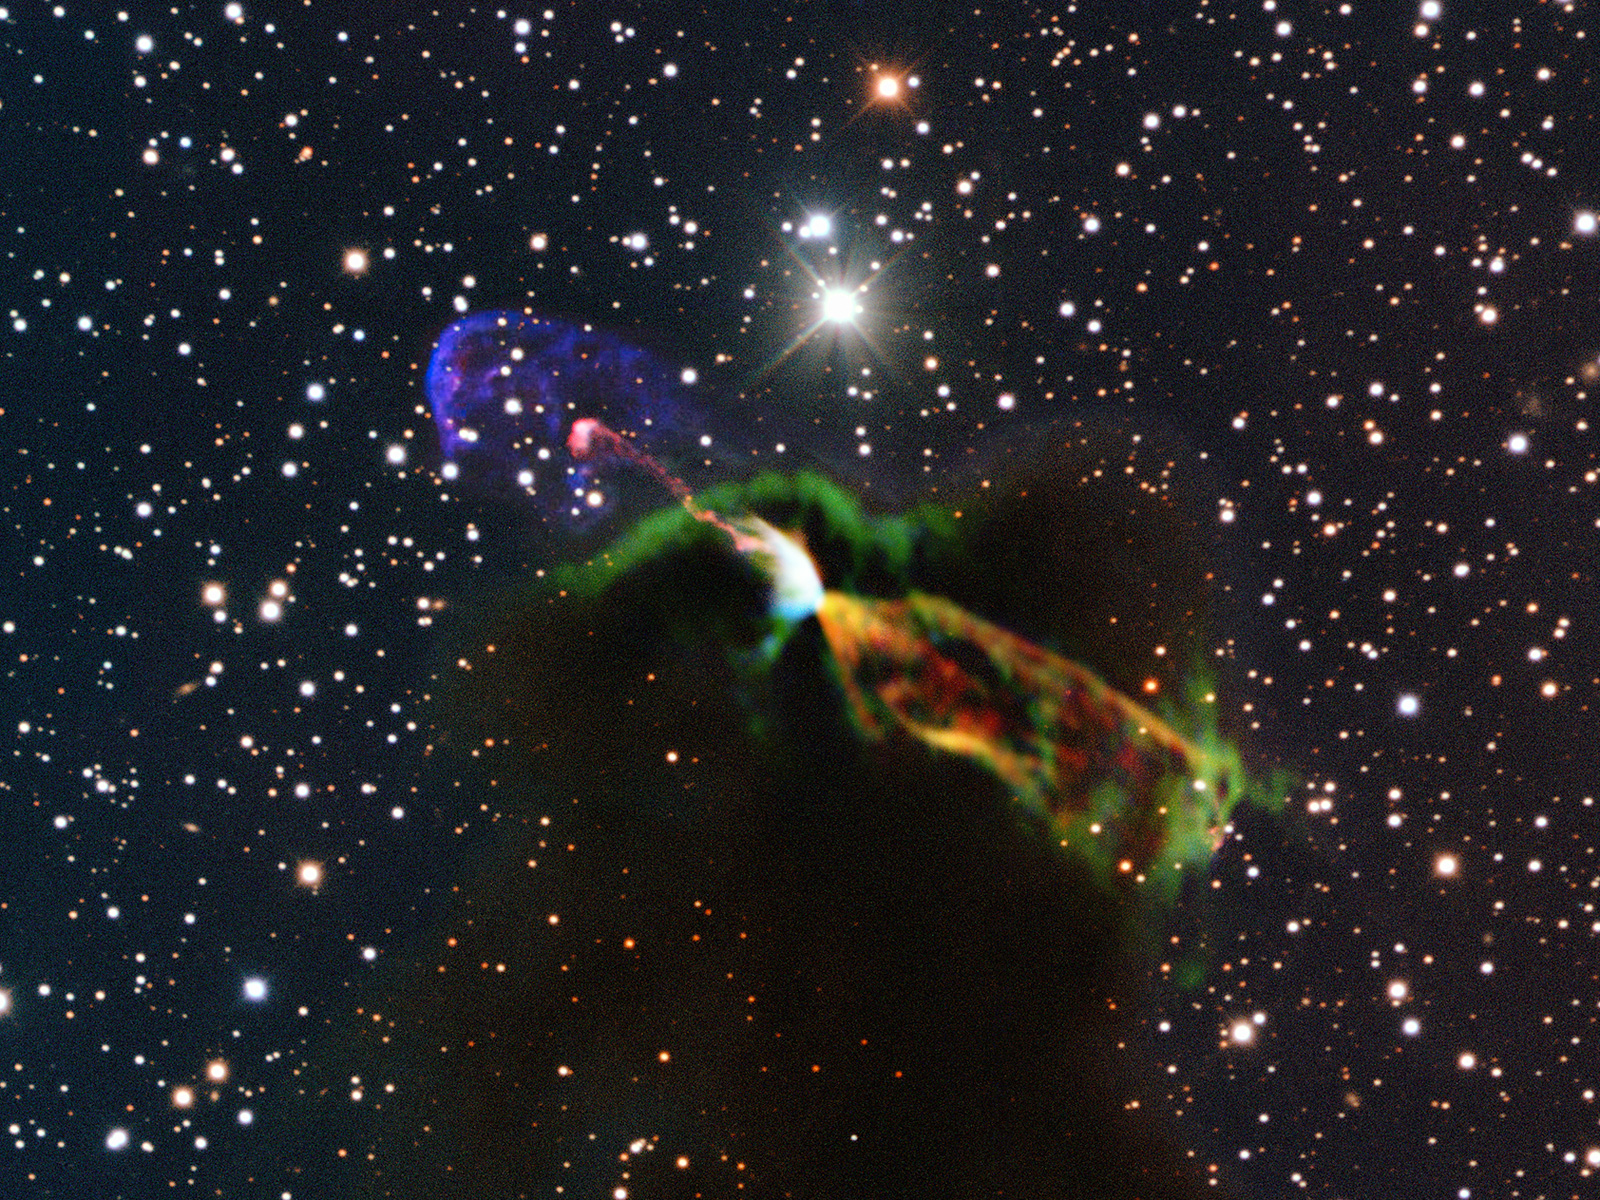 Newborn Star HH 46/47